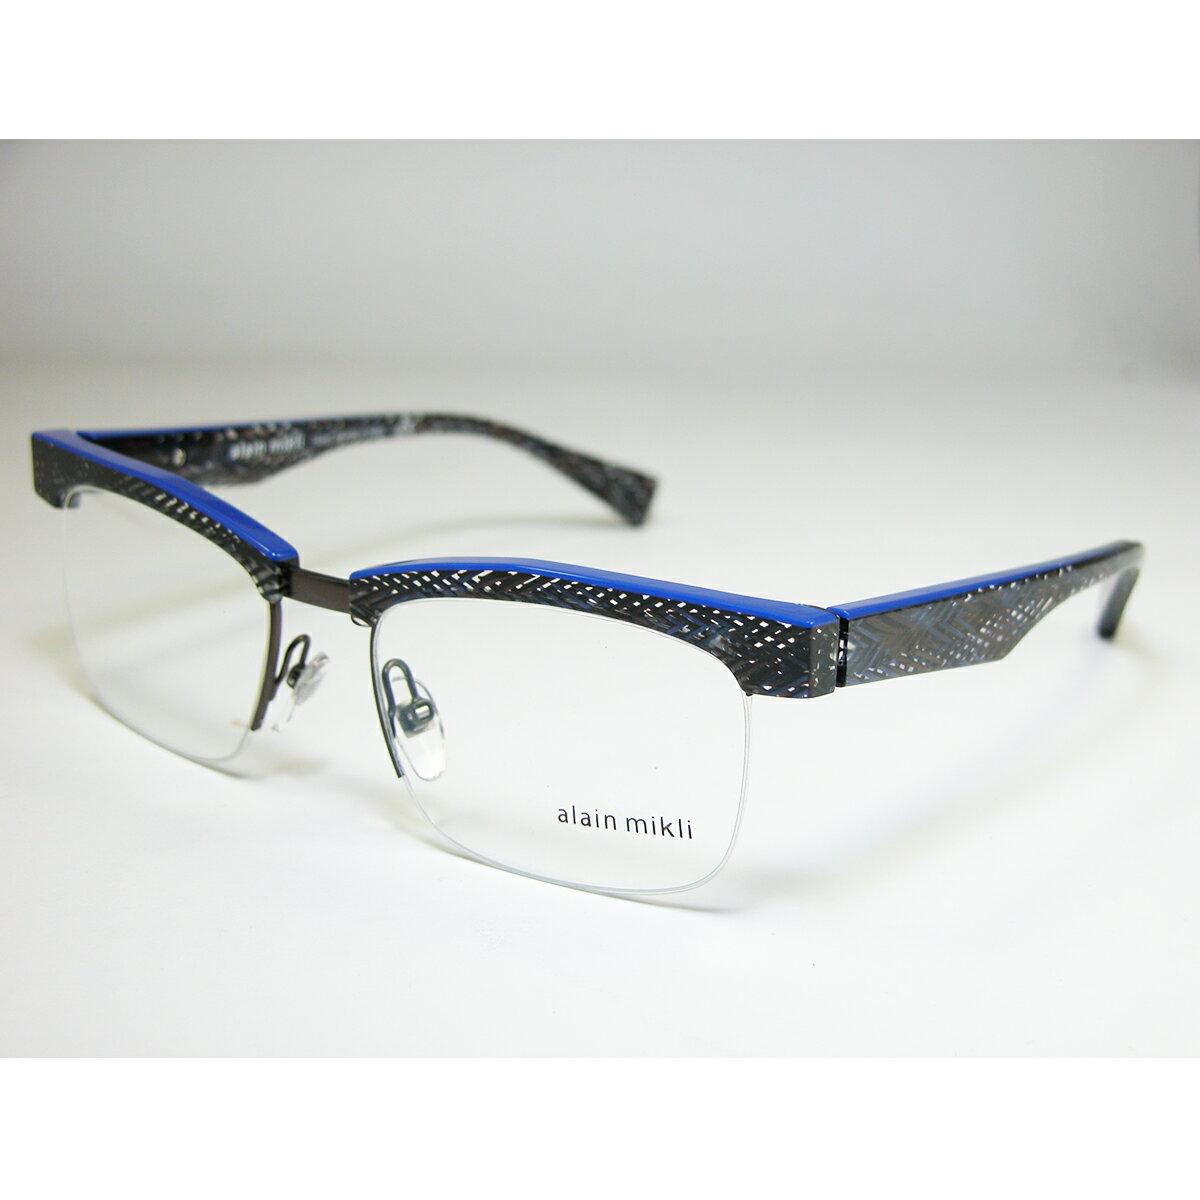 alain mikli アランミクリ メガネAO3055 カラーB111【楽ギフ_包装】 メンズ メガネ サングラス 眼鏡【ありがとう】【店頭受取対応商品】